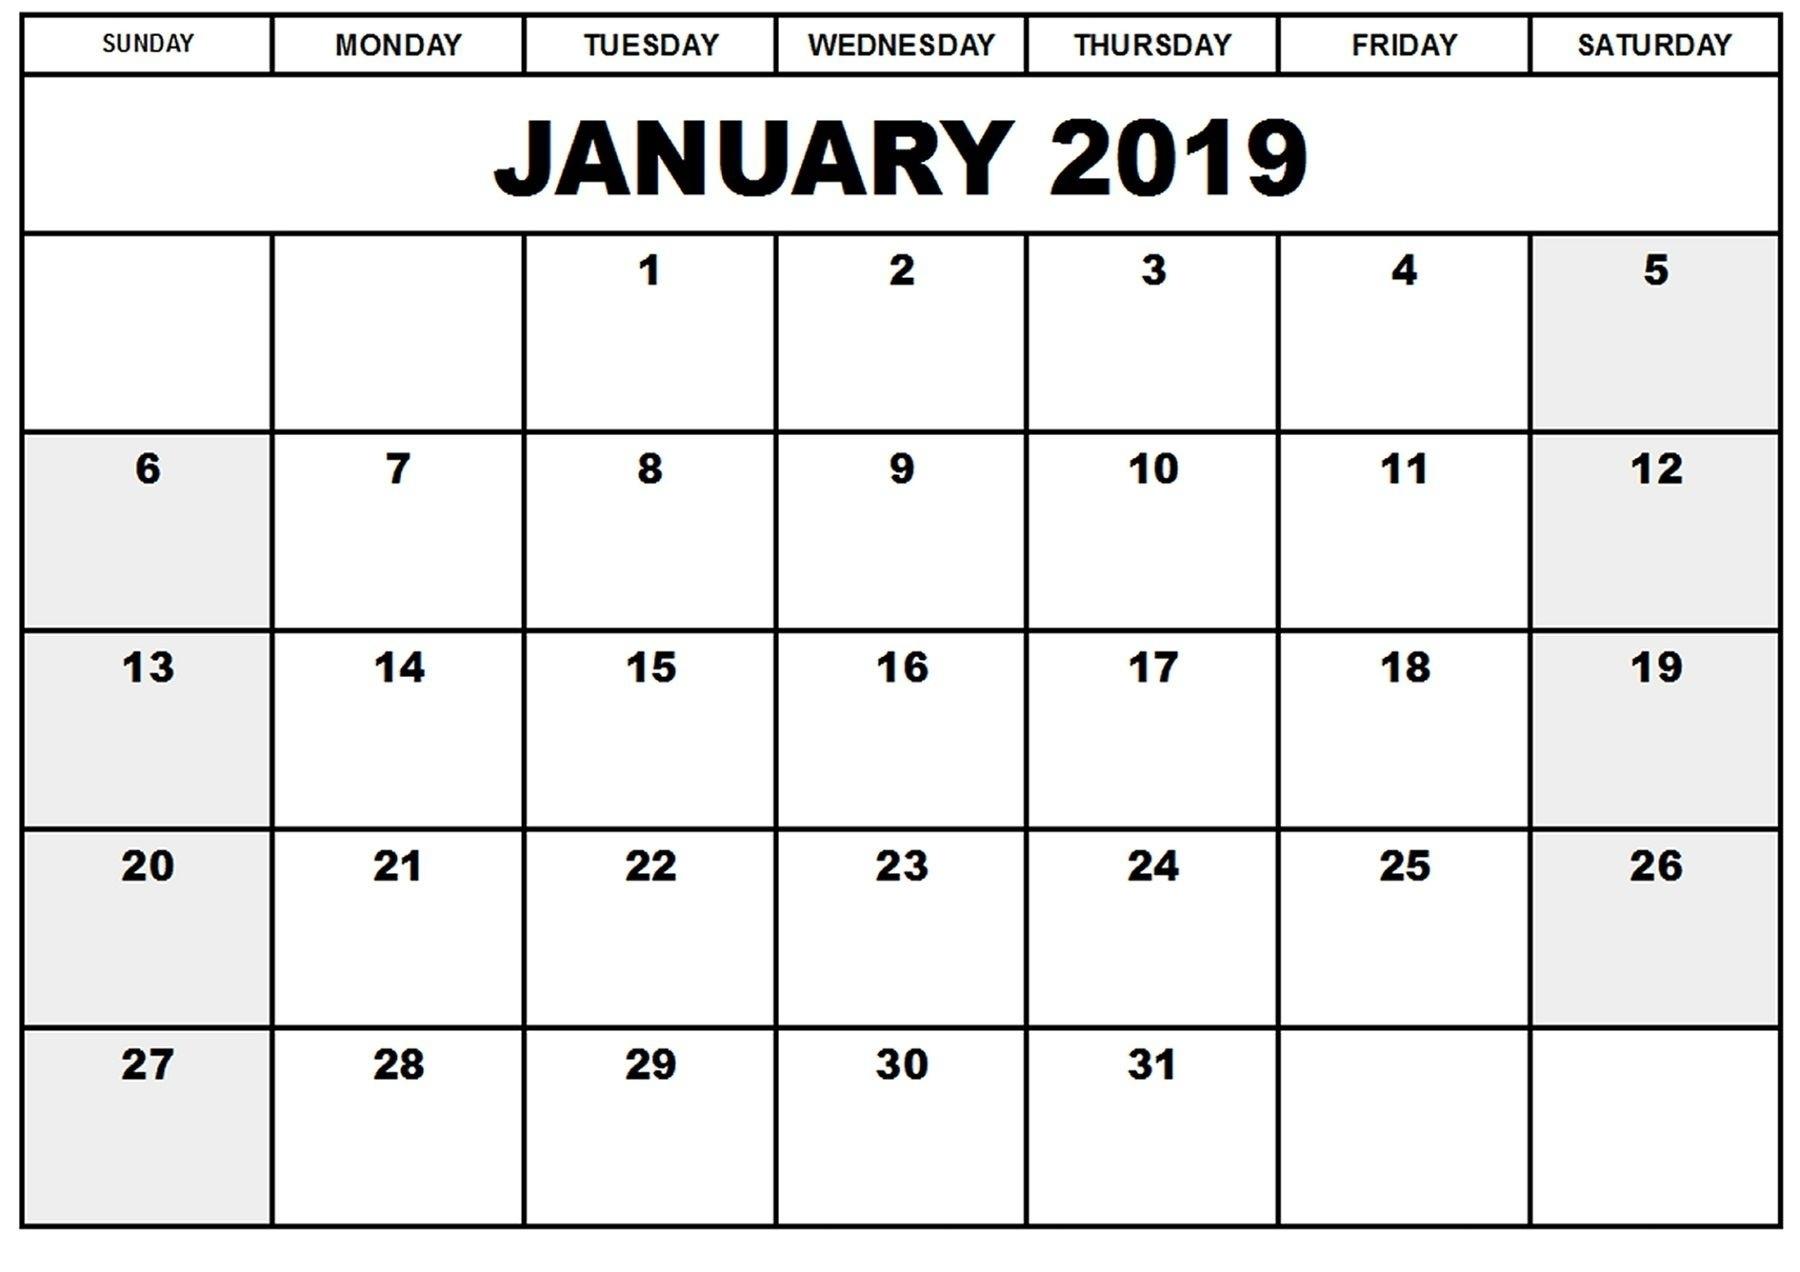 February 2019 Calendar Waterproof   Qualads